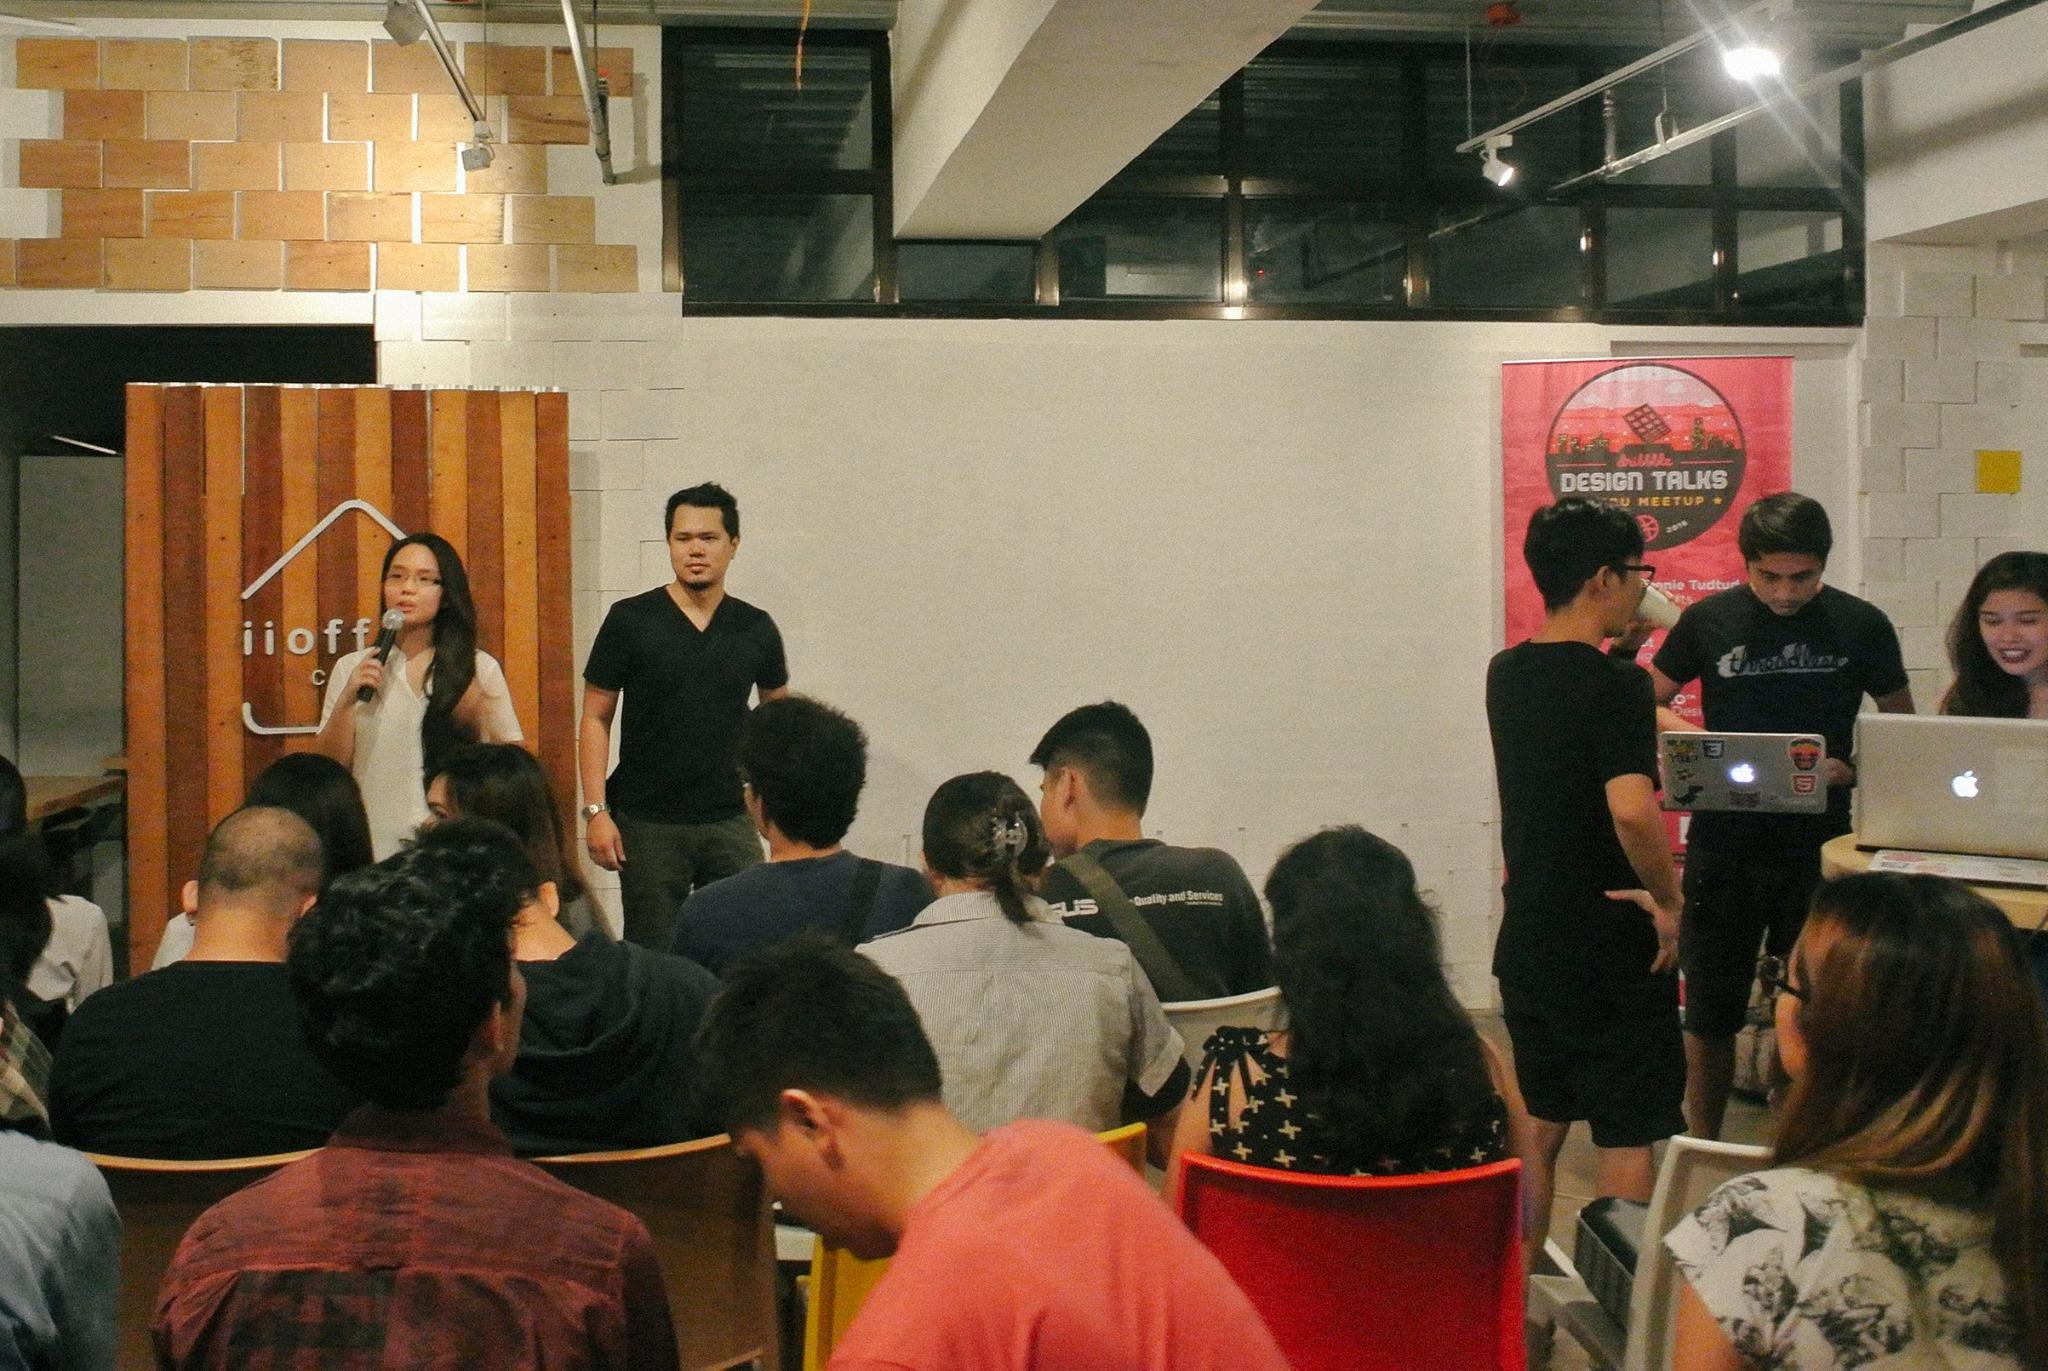 Dribbble Cebu Meetup 2 at iioffice CEBU